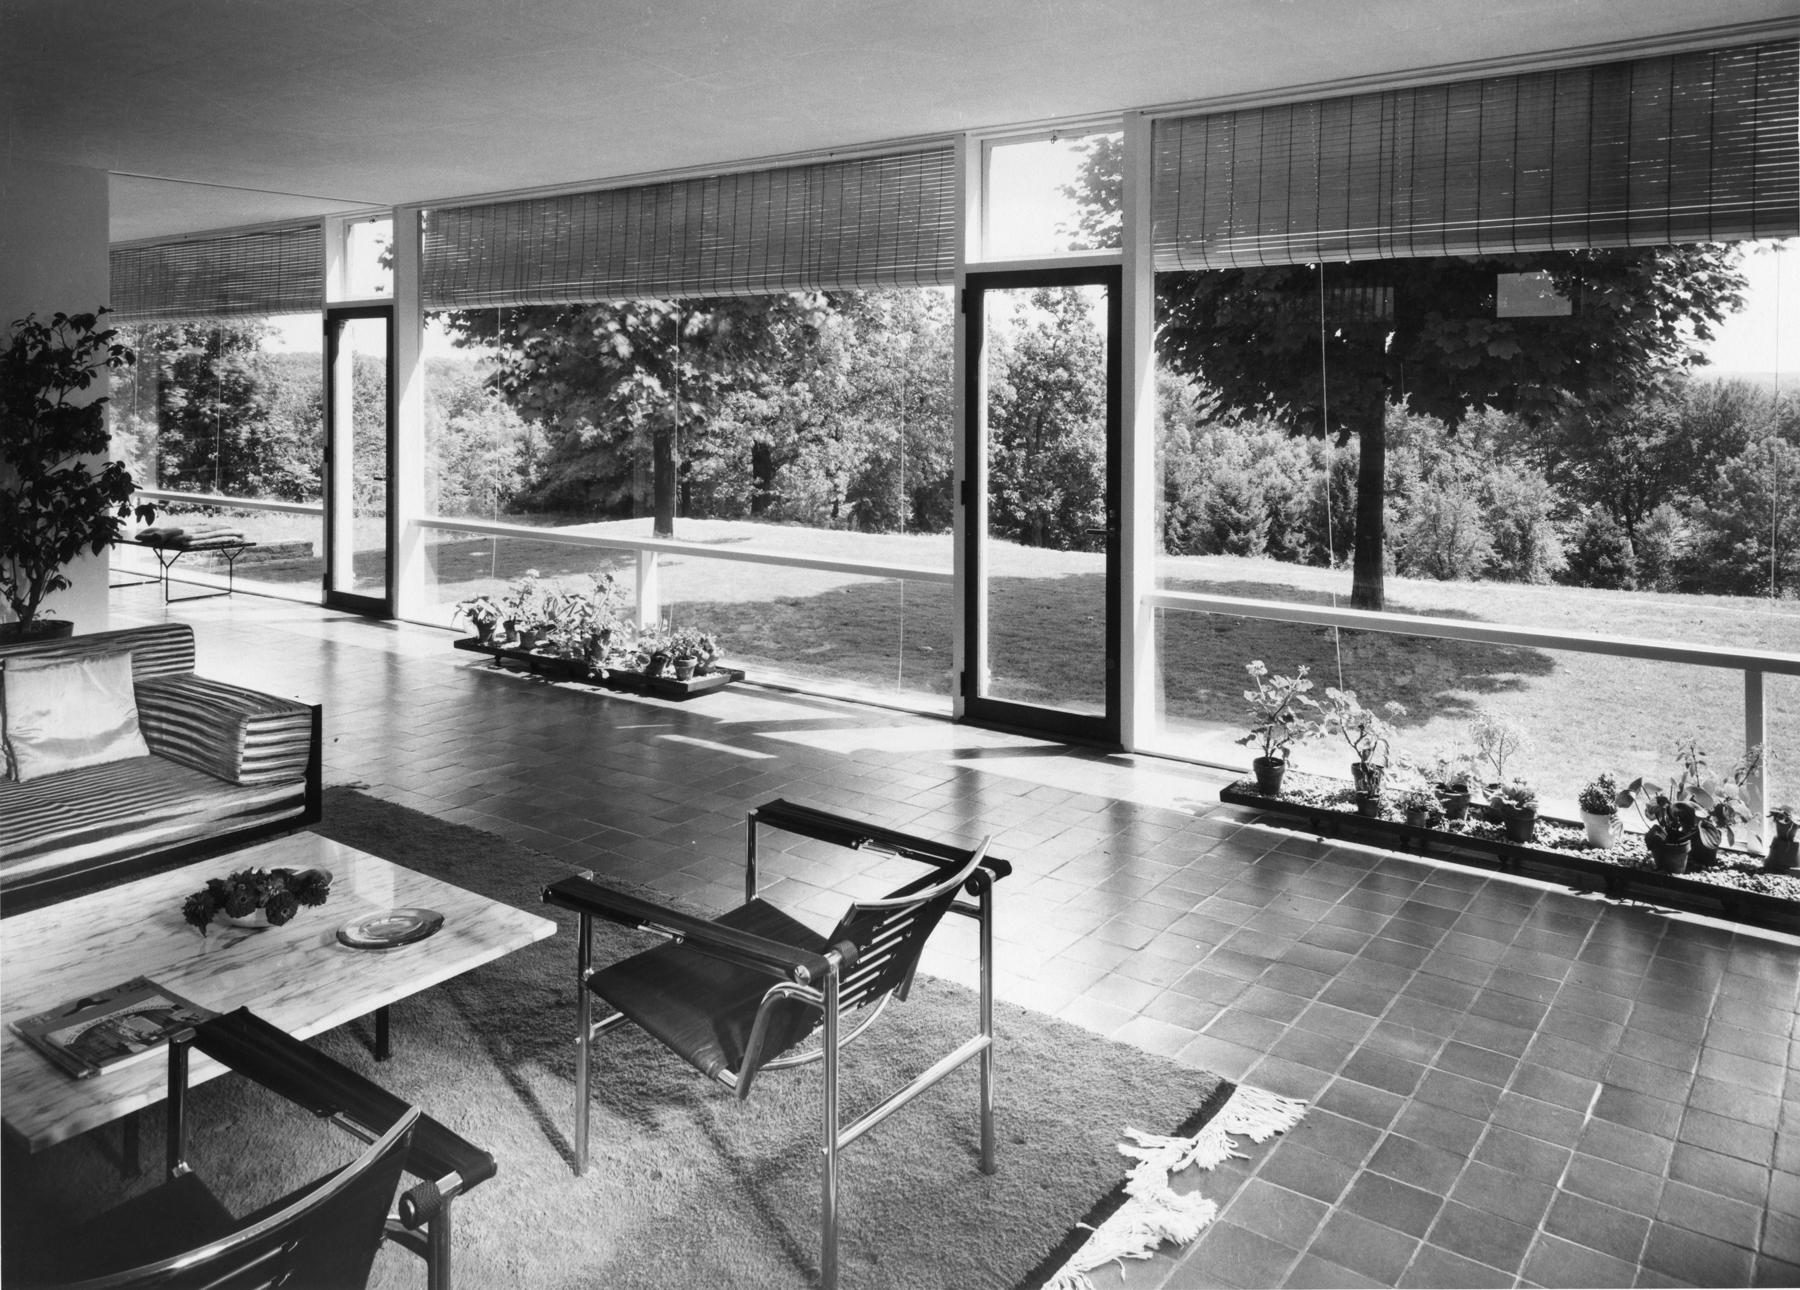 Edward Larrabee Barnes home in Westchester, New York